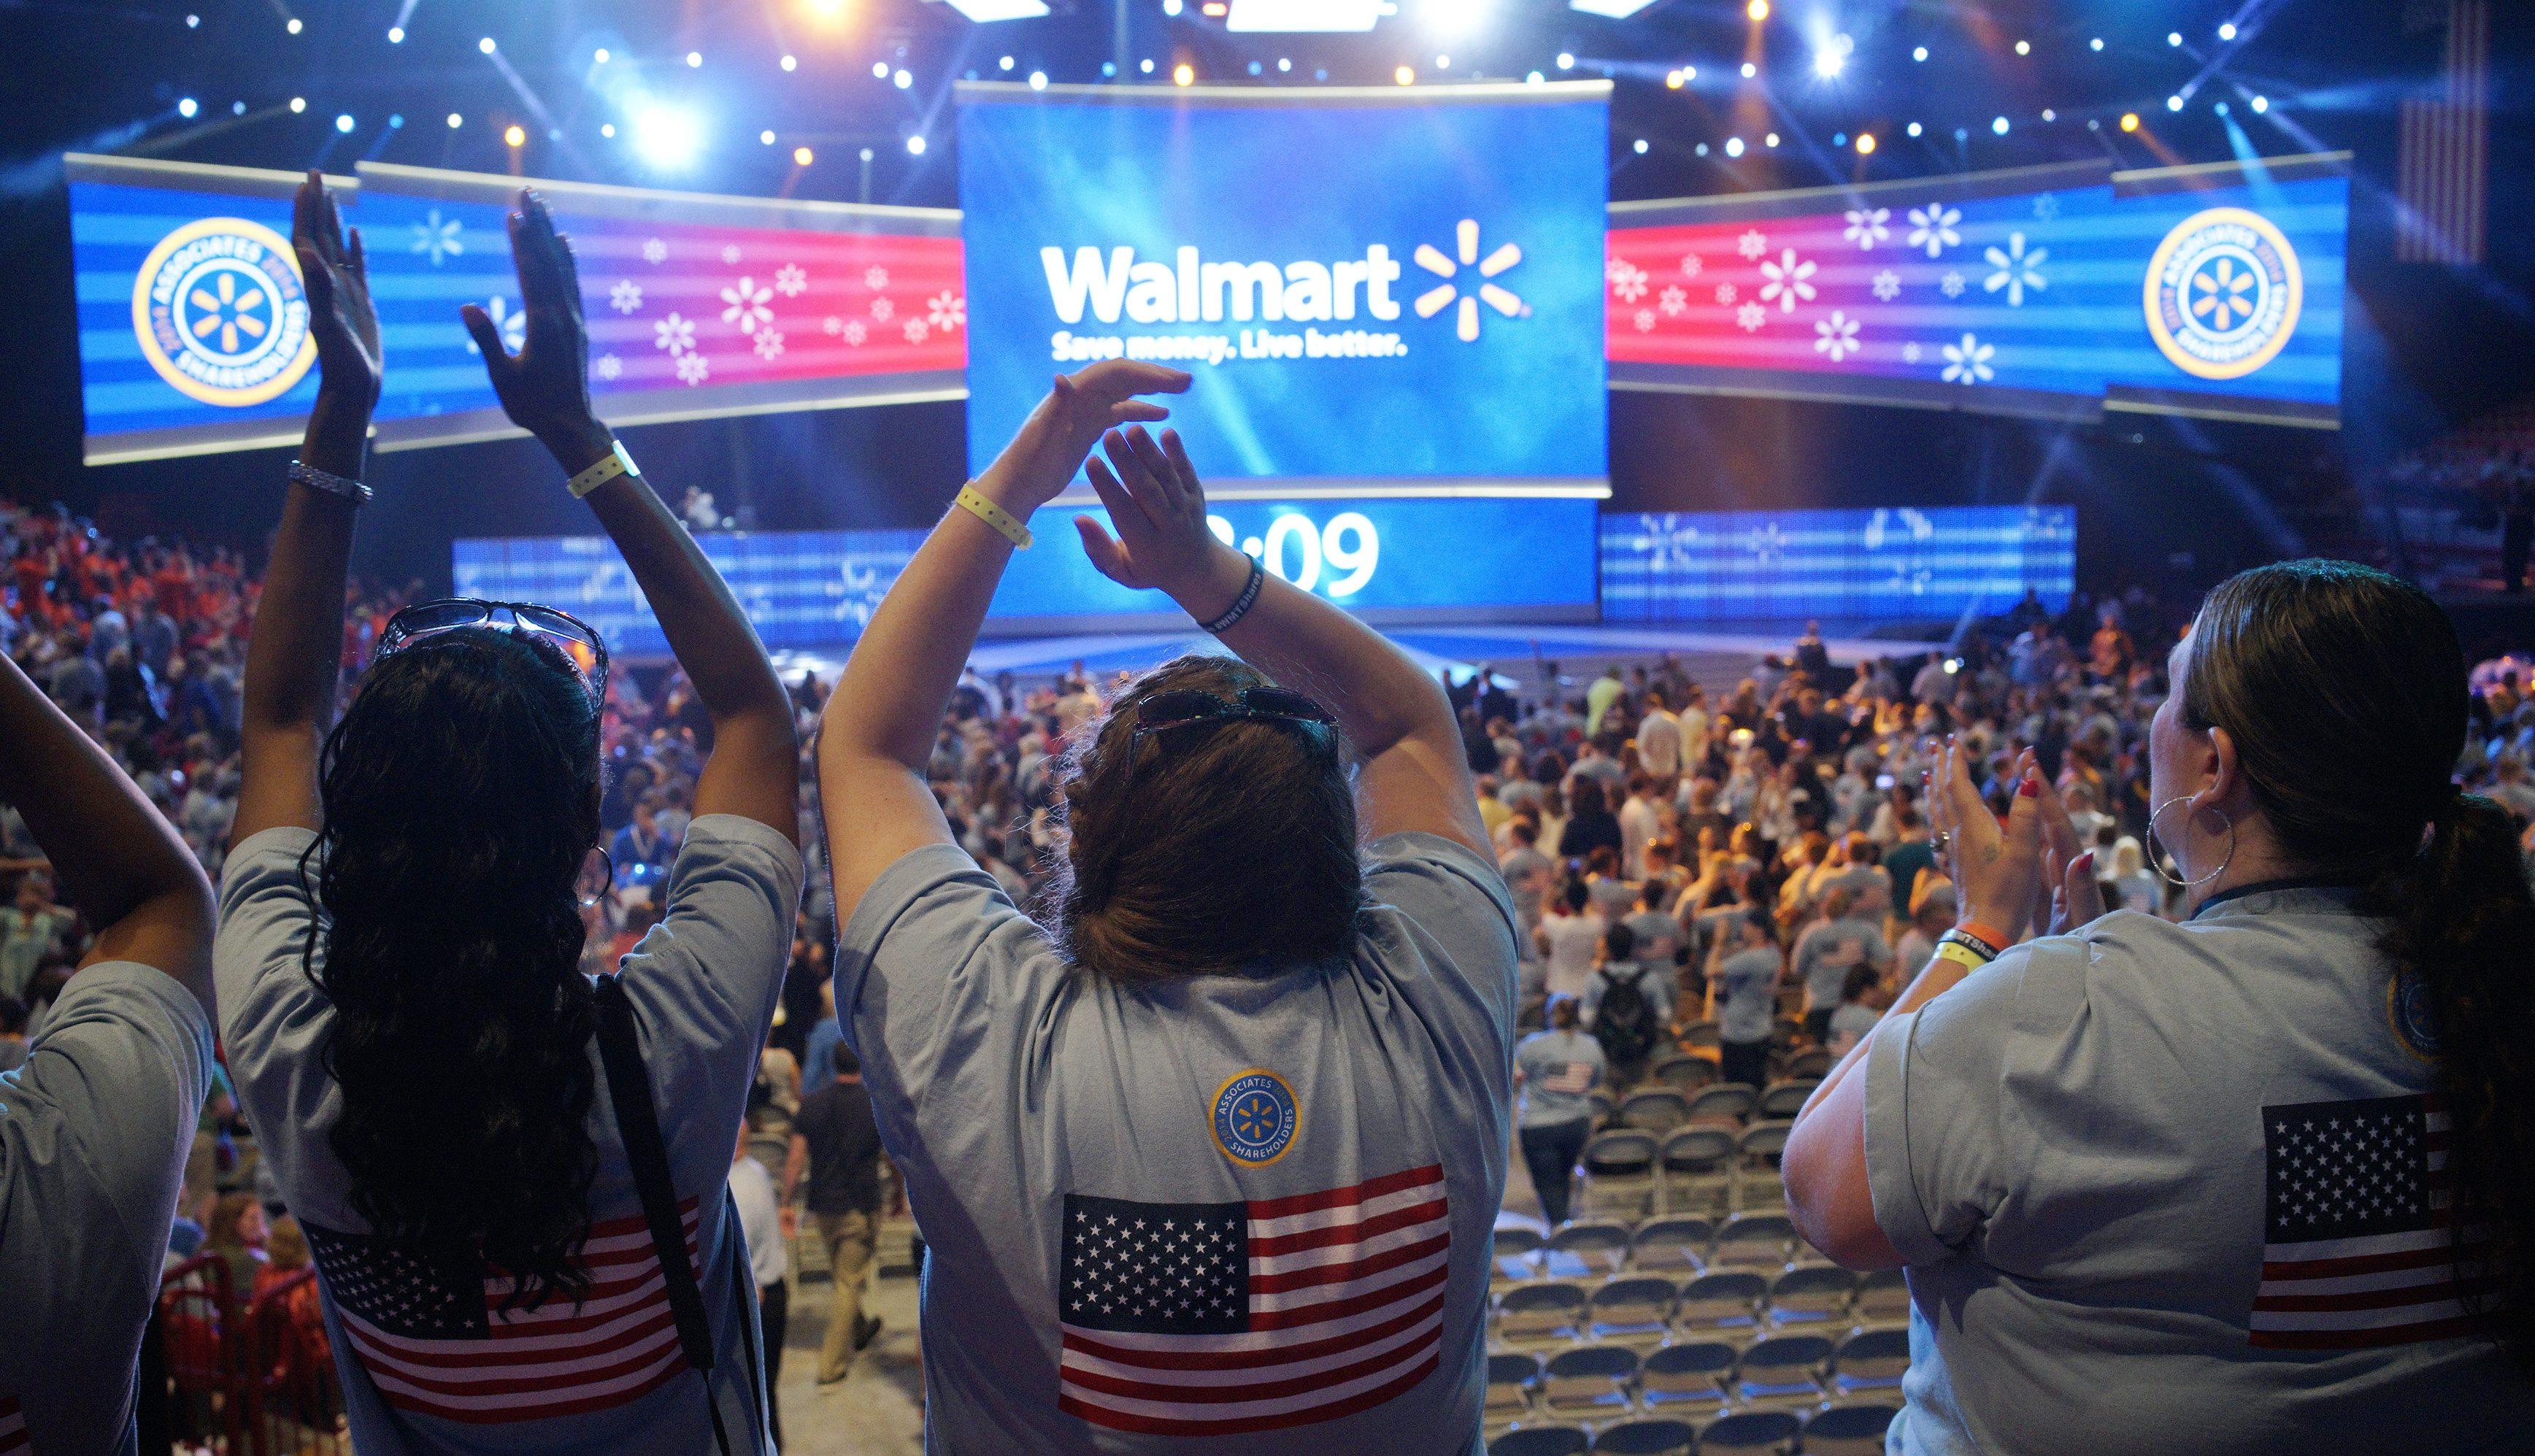 Walmart employees cheer at the Walmart U.S. associates meeting in Fayetteville, Arkansas June 4, 2014. The meeting was part of Walmart's annual shareholder meeting.